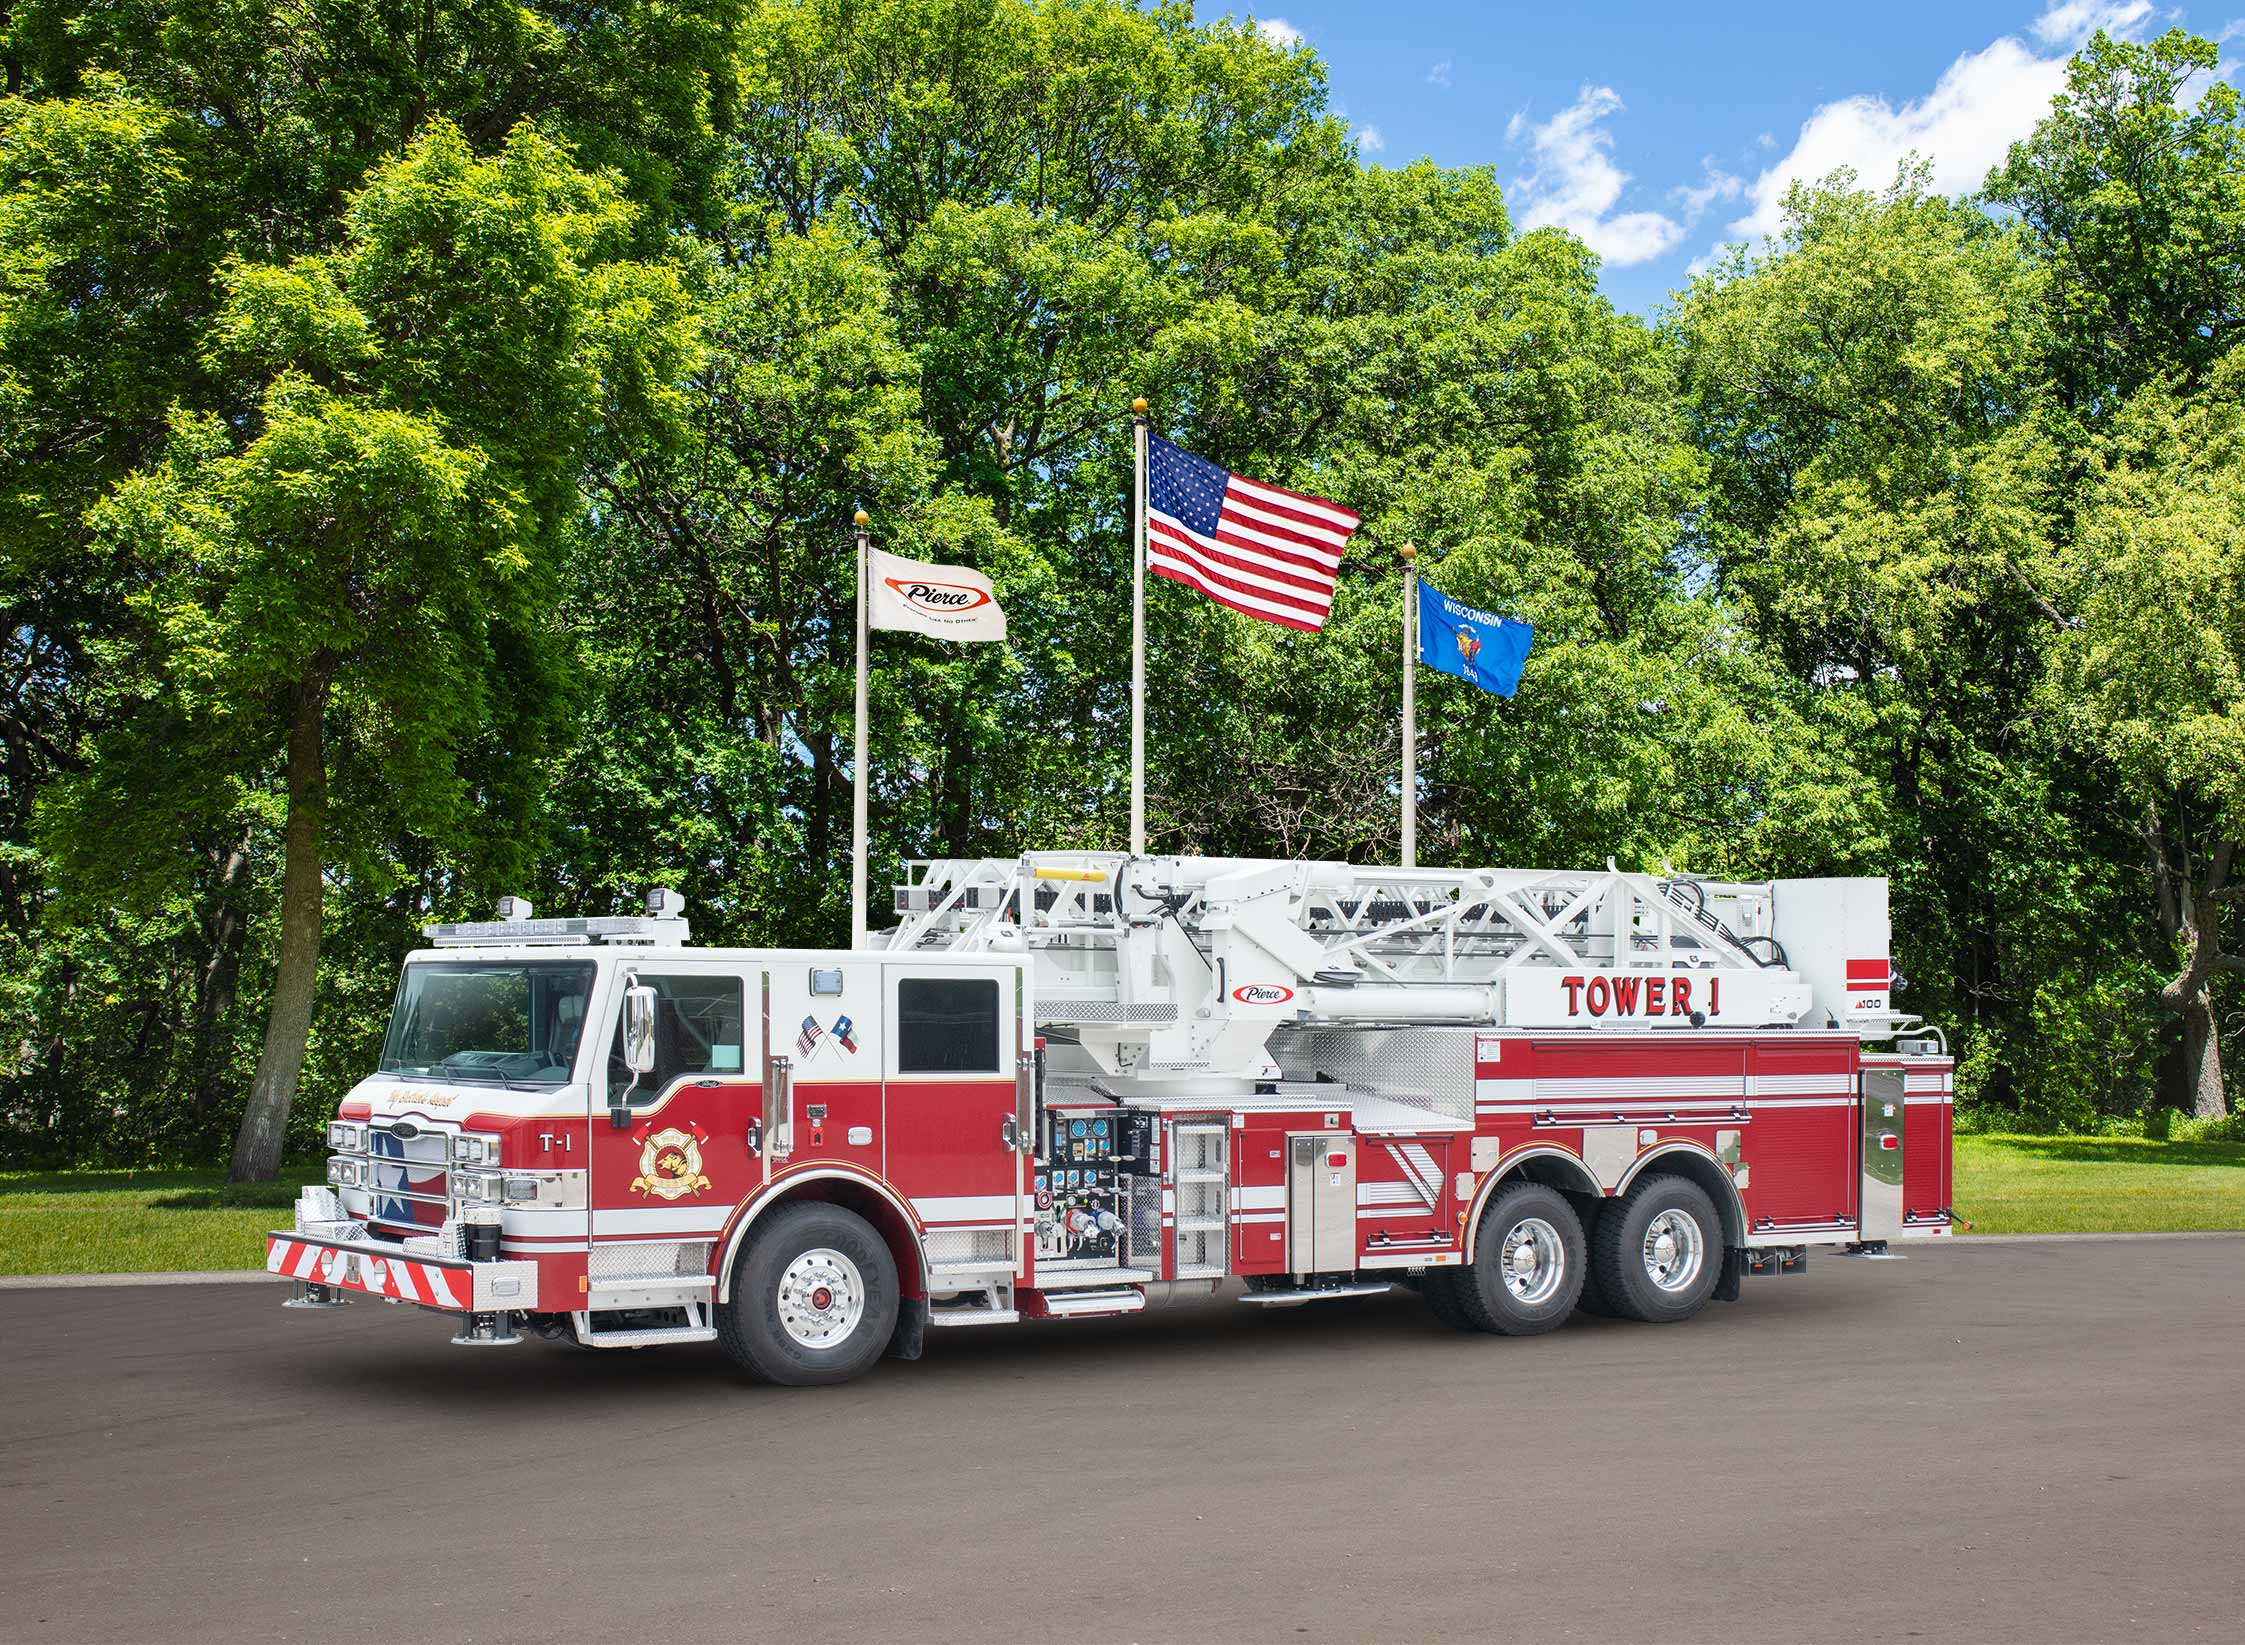 Gulf Coast Growth Ventures Fire & Emergency - Aerial